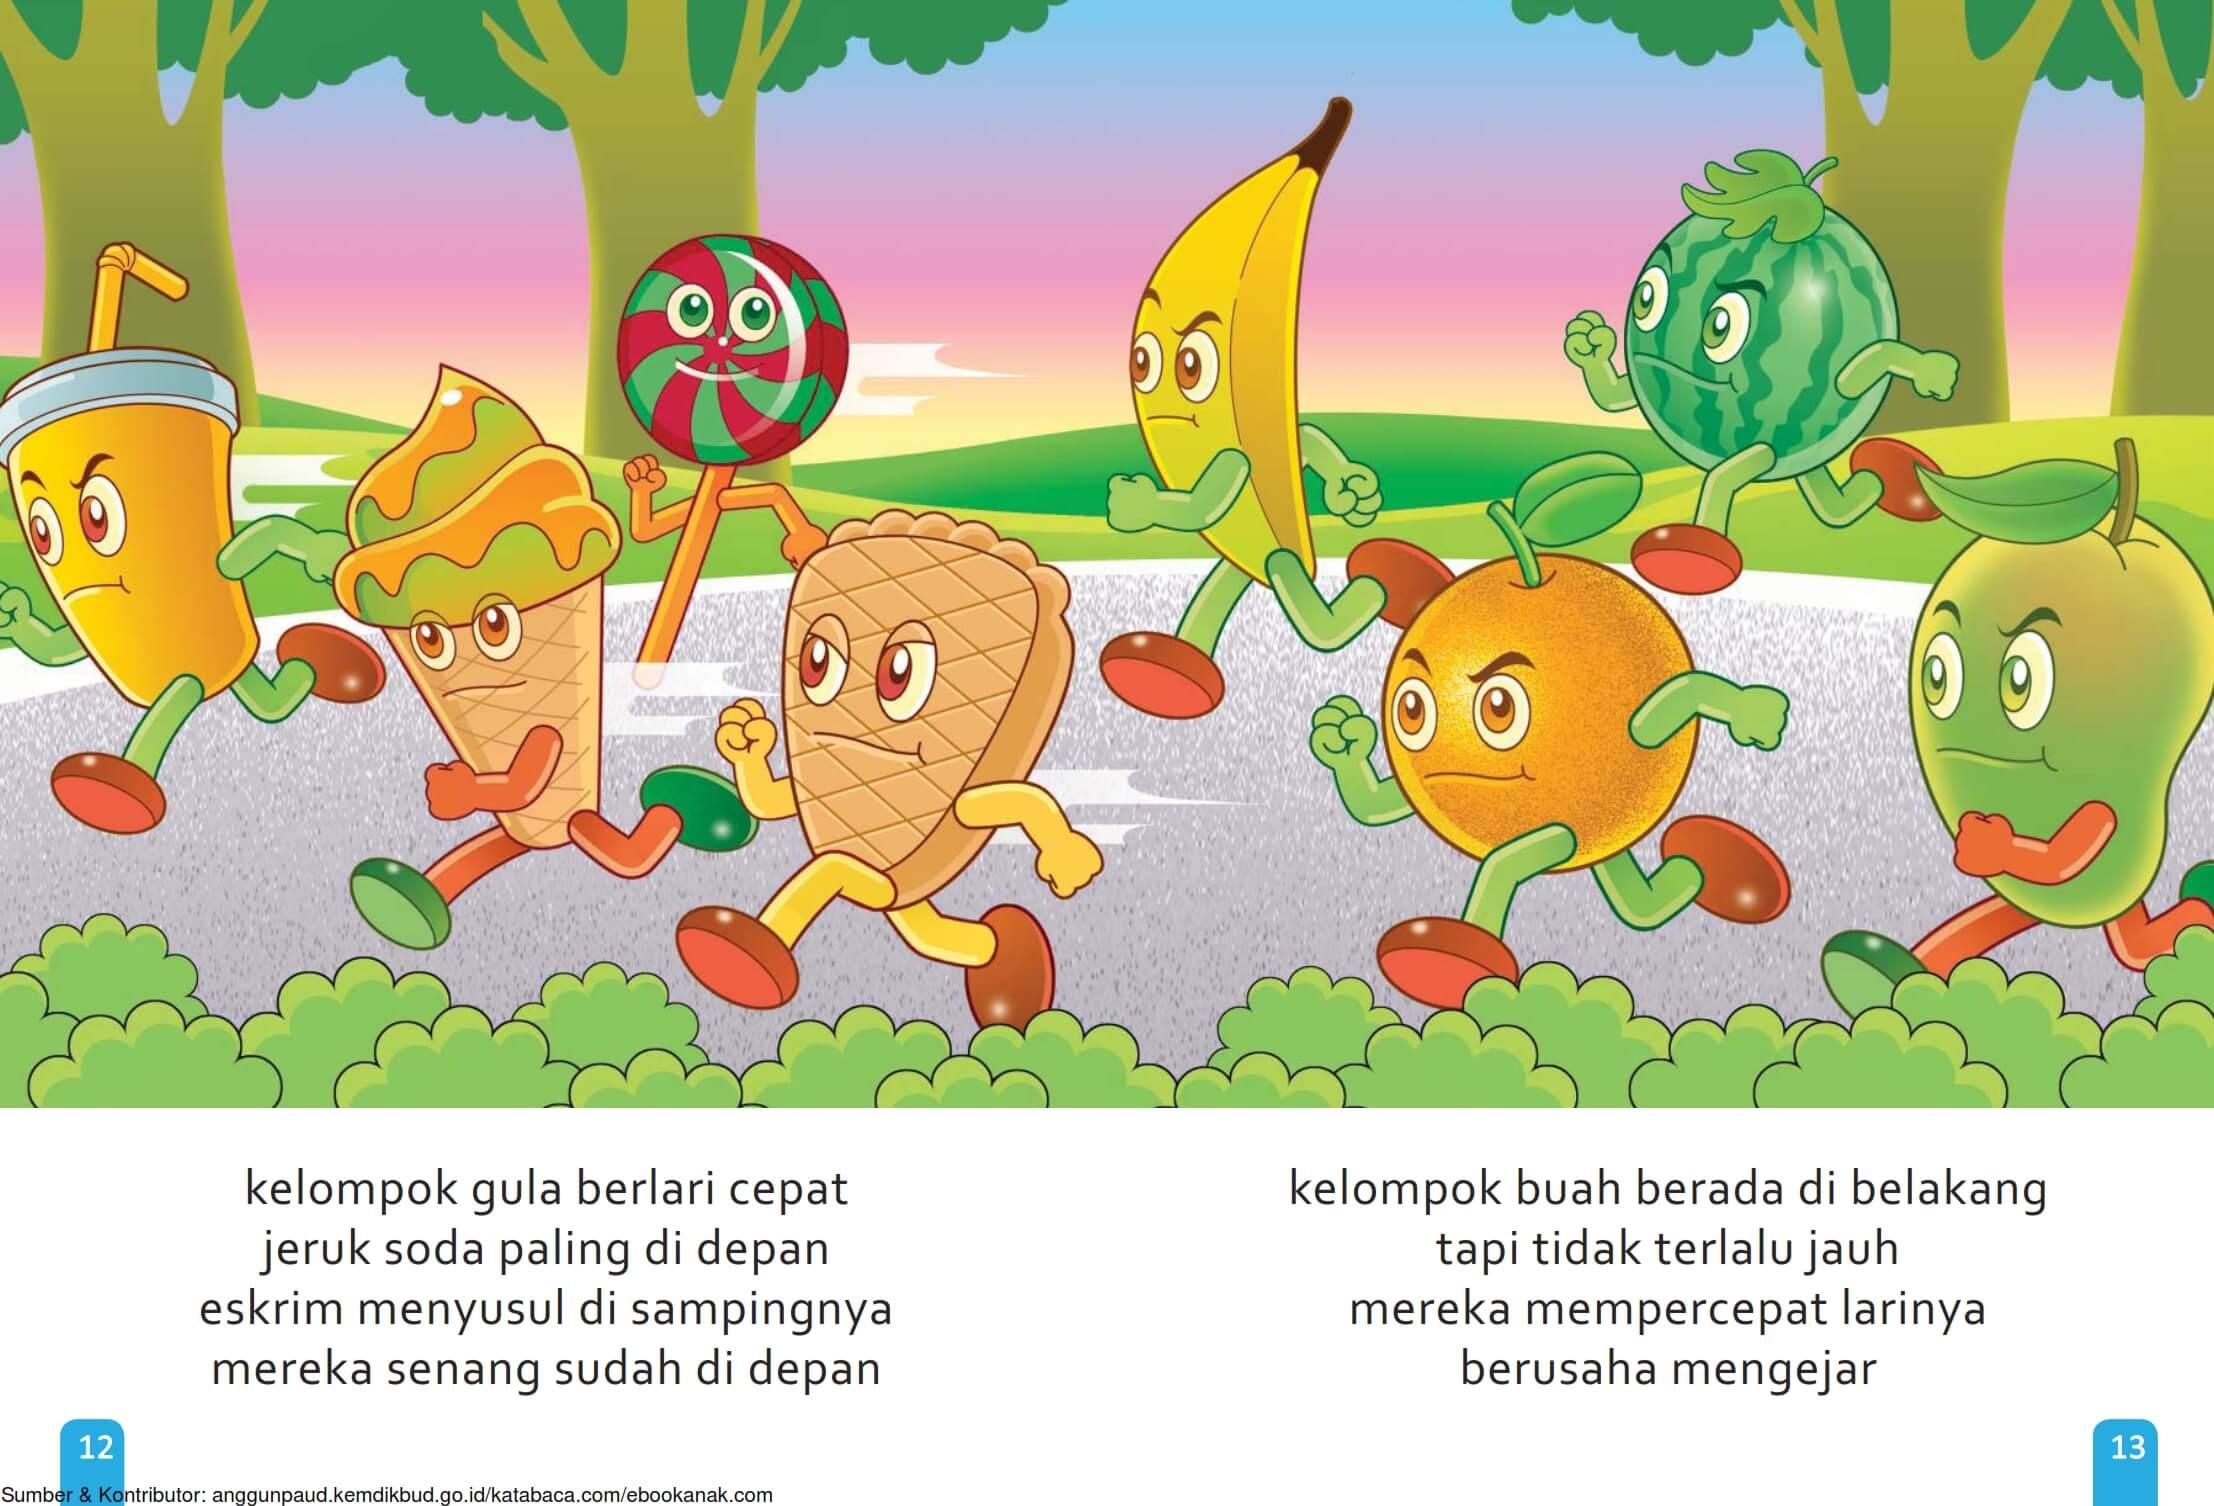 Ebook Cerita Anak, Aku Suka Buah, Kelompok Gula Berlari Cepat (9)